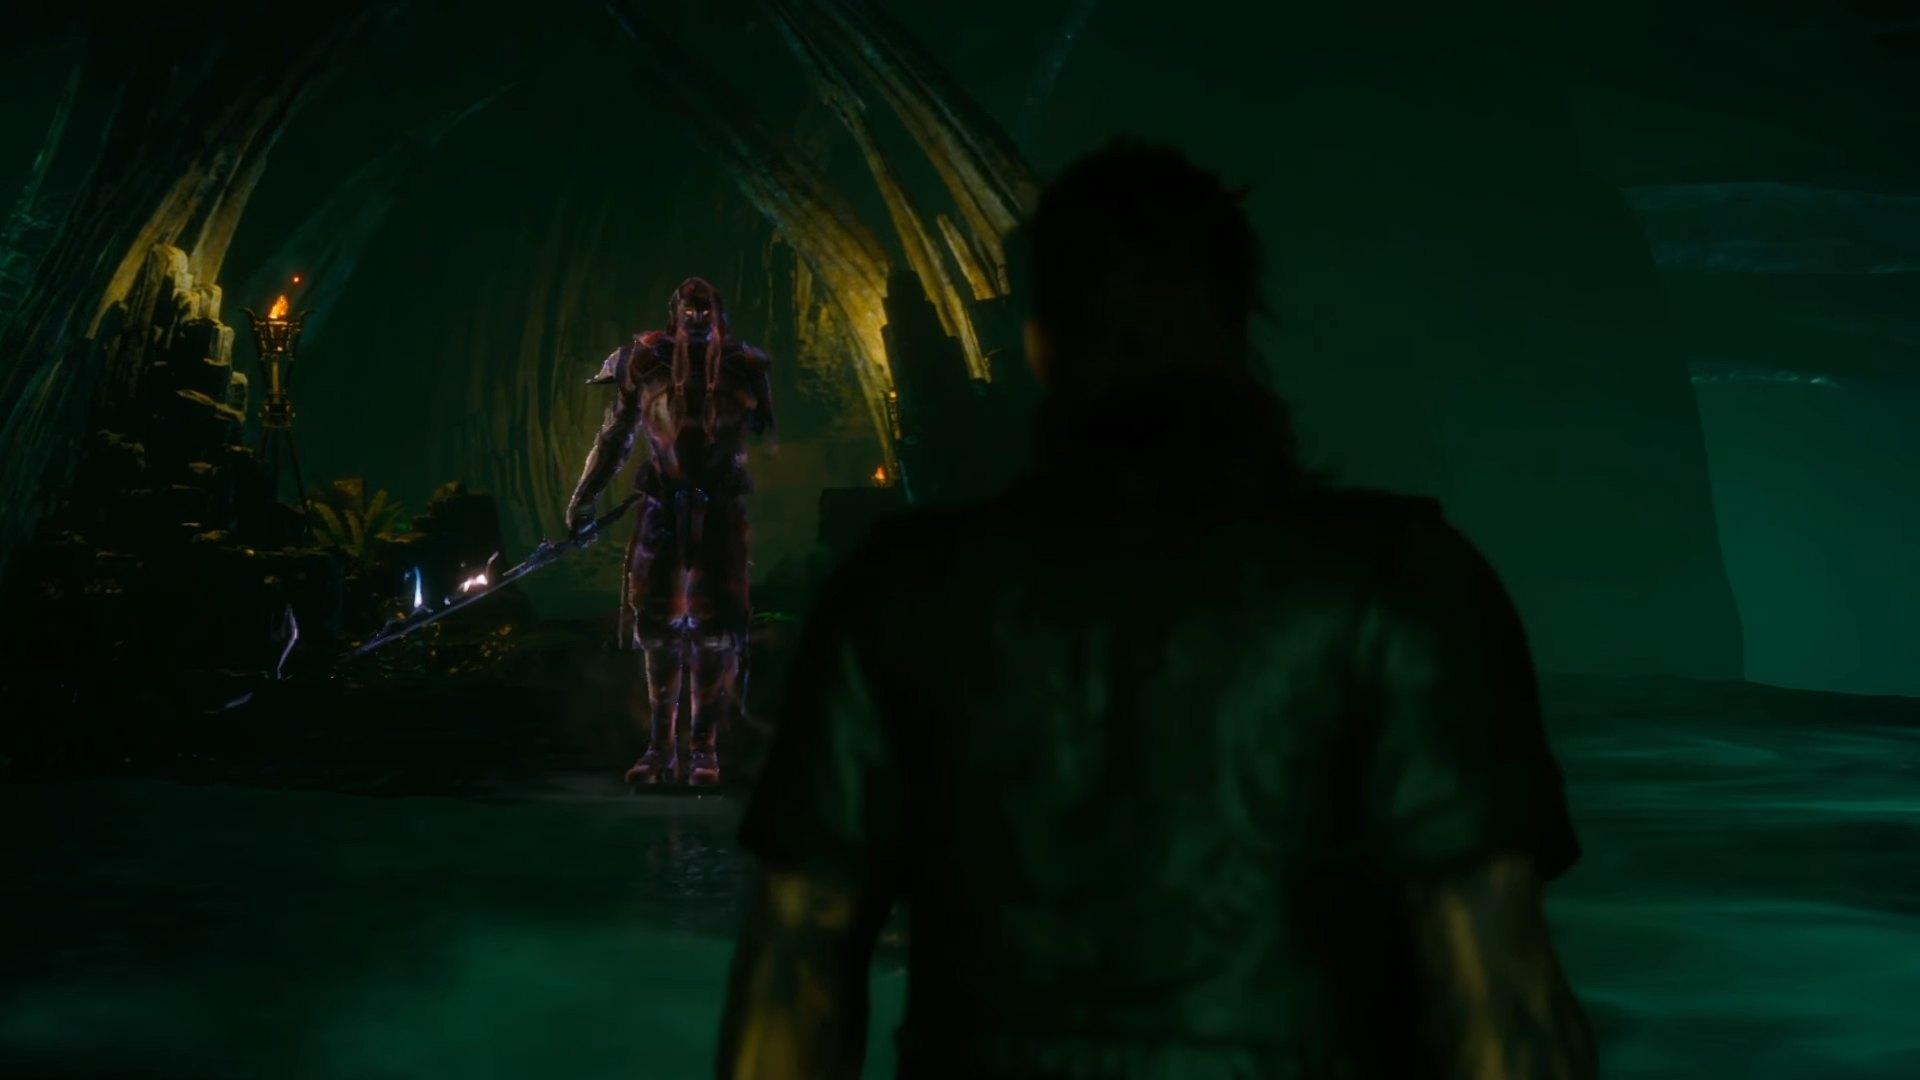 ffxv episode gladiolus trailer